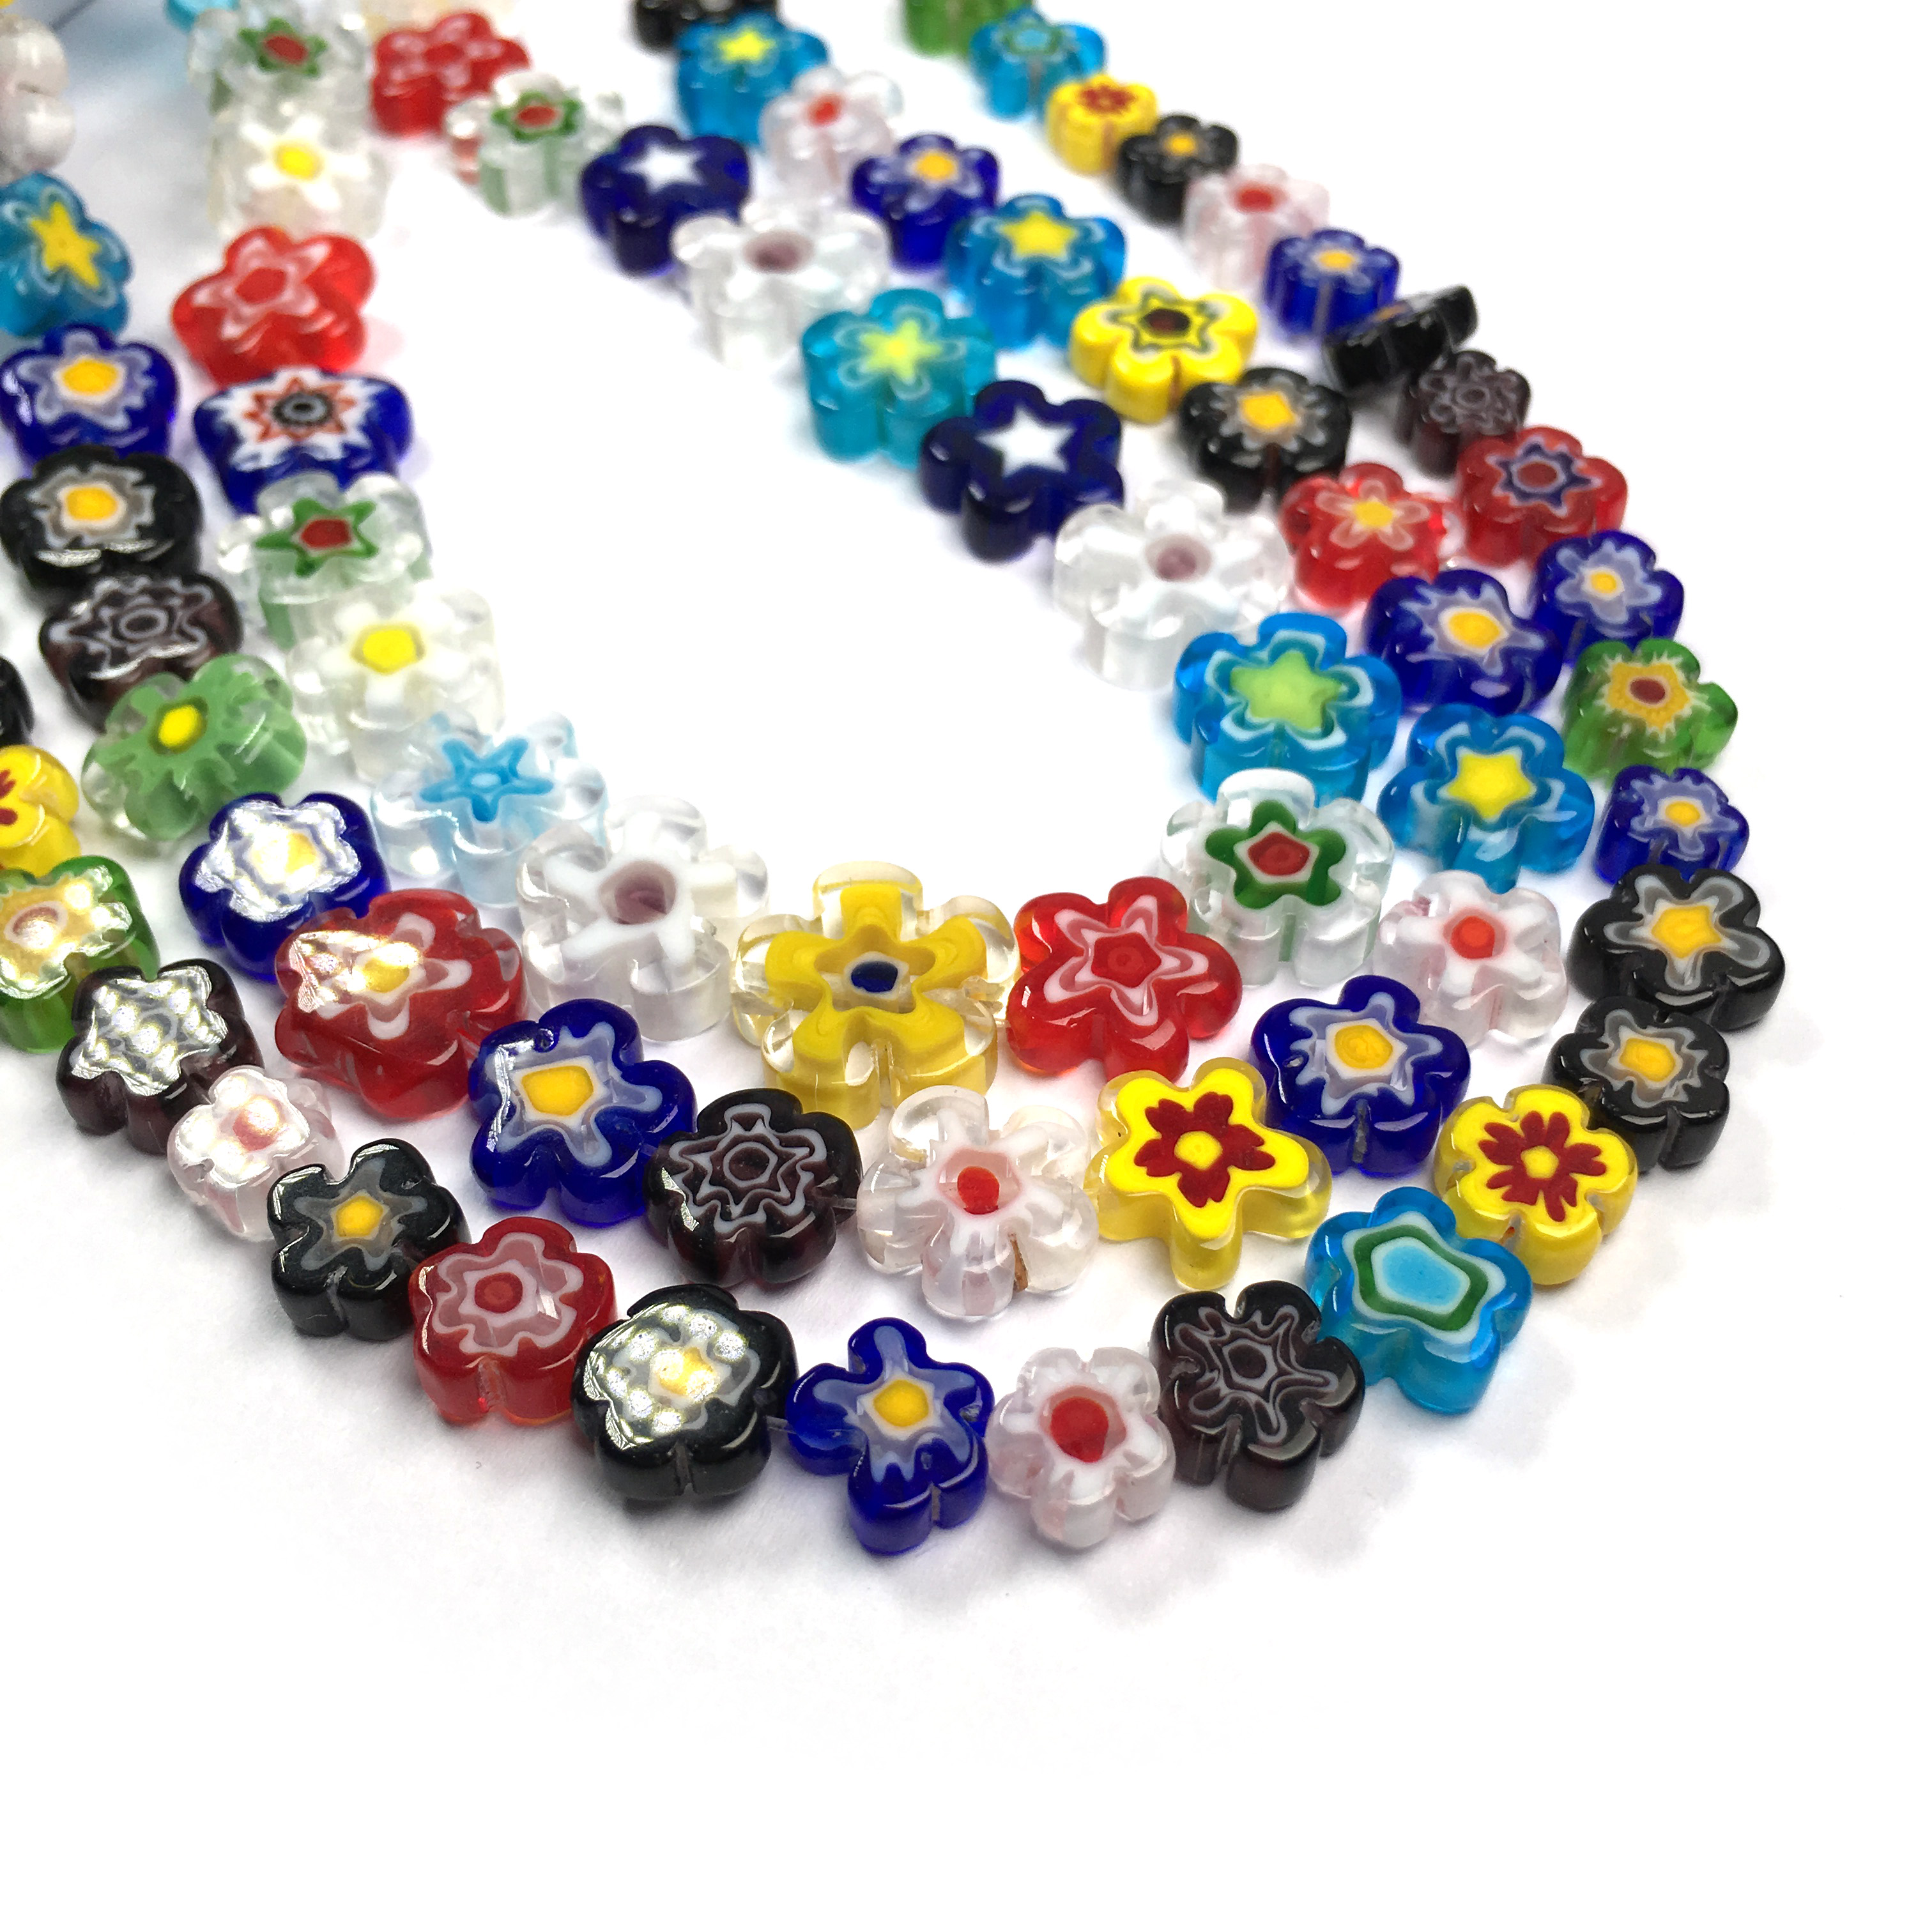 Flower Lampwork Bracelet Glass Flower Bracelet 20 cm Beaded Salmon Bracelet Lampwork Beads Flower